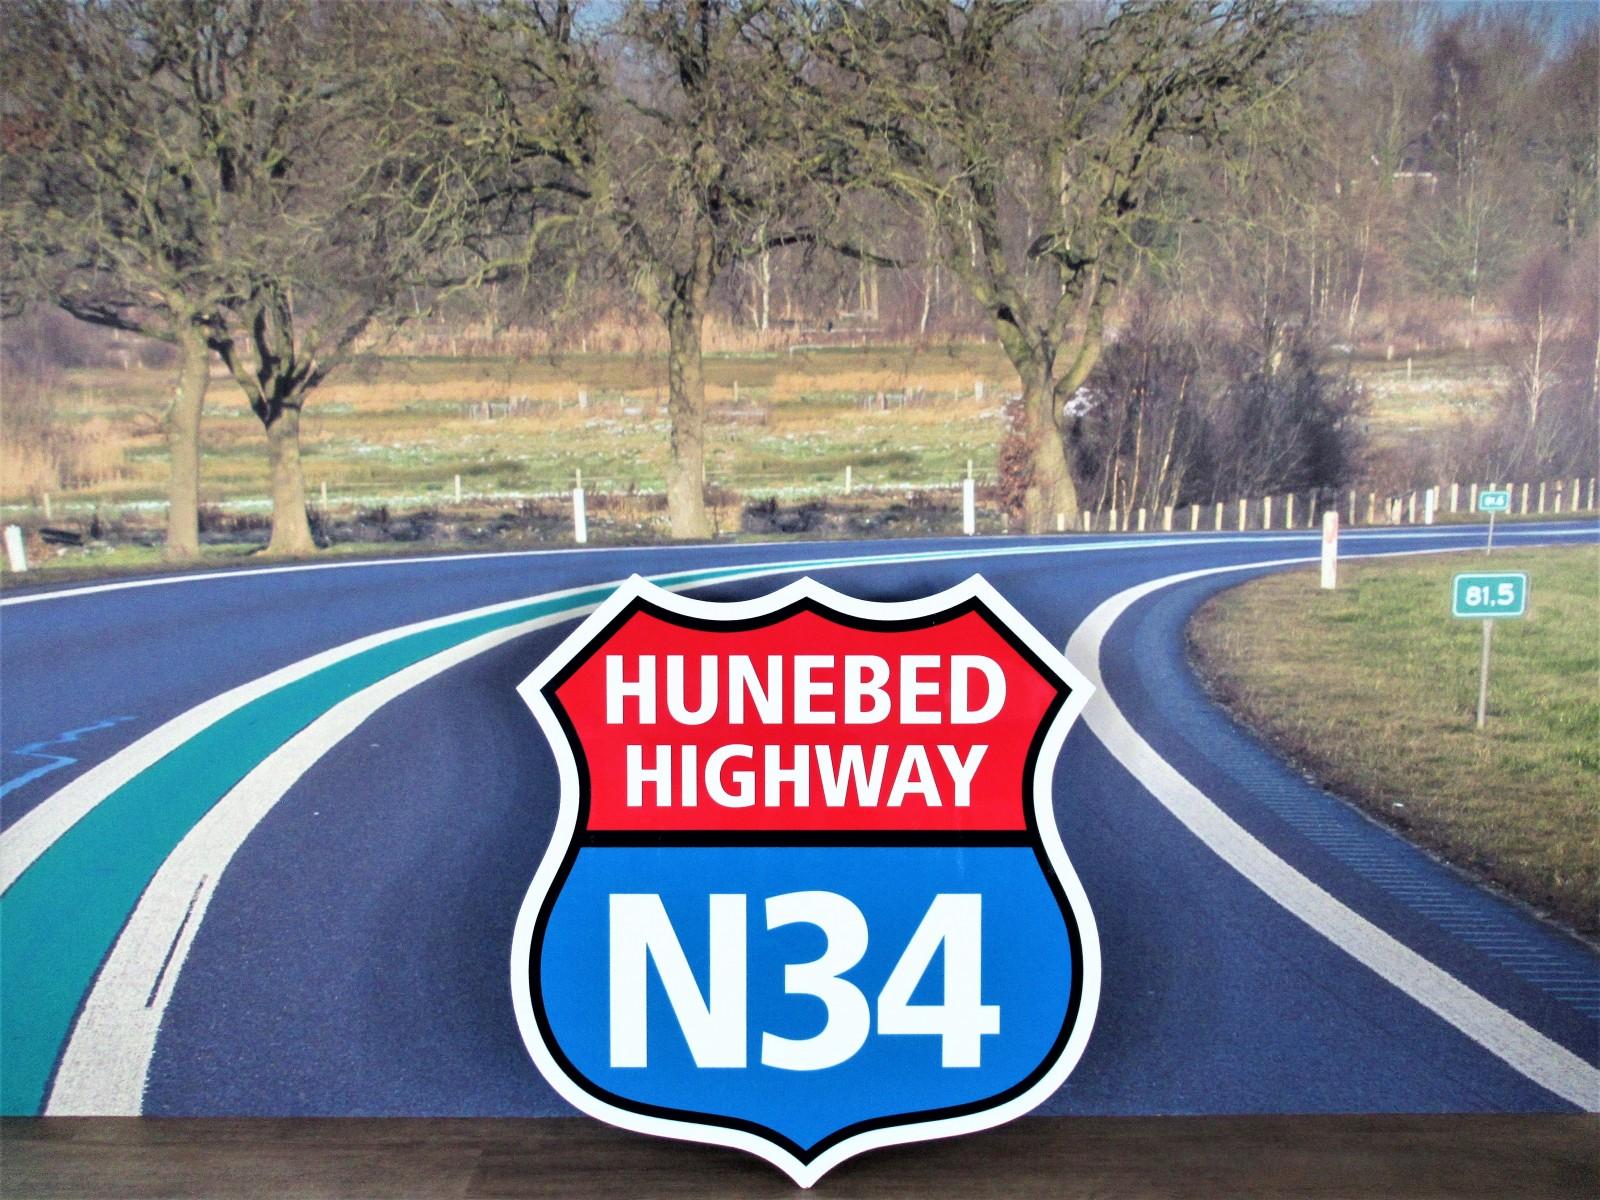 Foto hunebed Highway